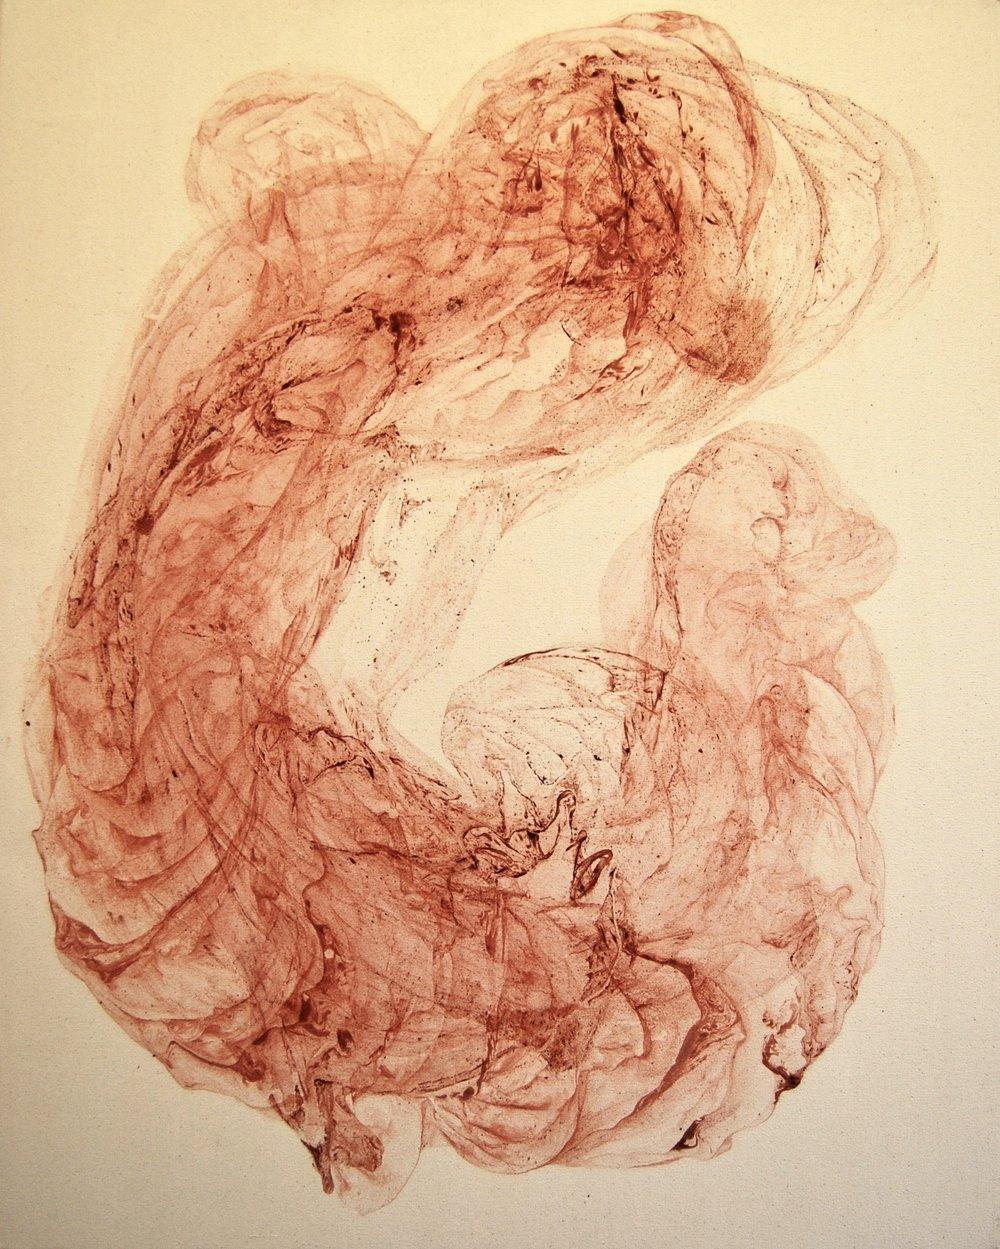 Odilia Suanzes, Odilia Suanzes. Untitled, Oxide pigment in canvas, 100 X 80 X 4 cm,  http://www.odiliasuazes.com